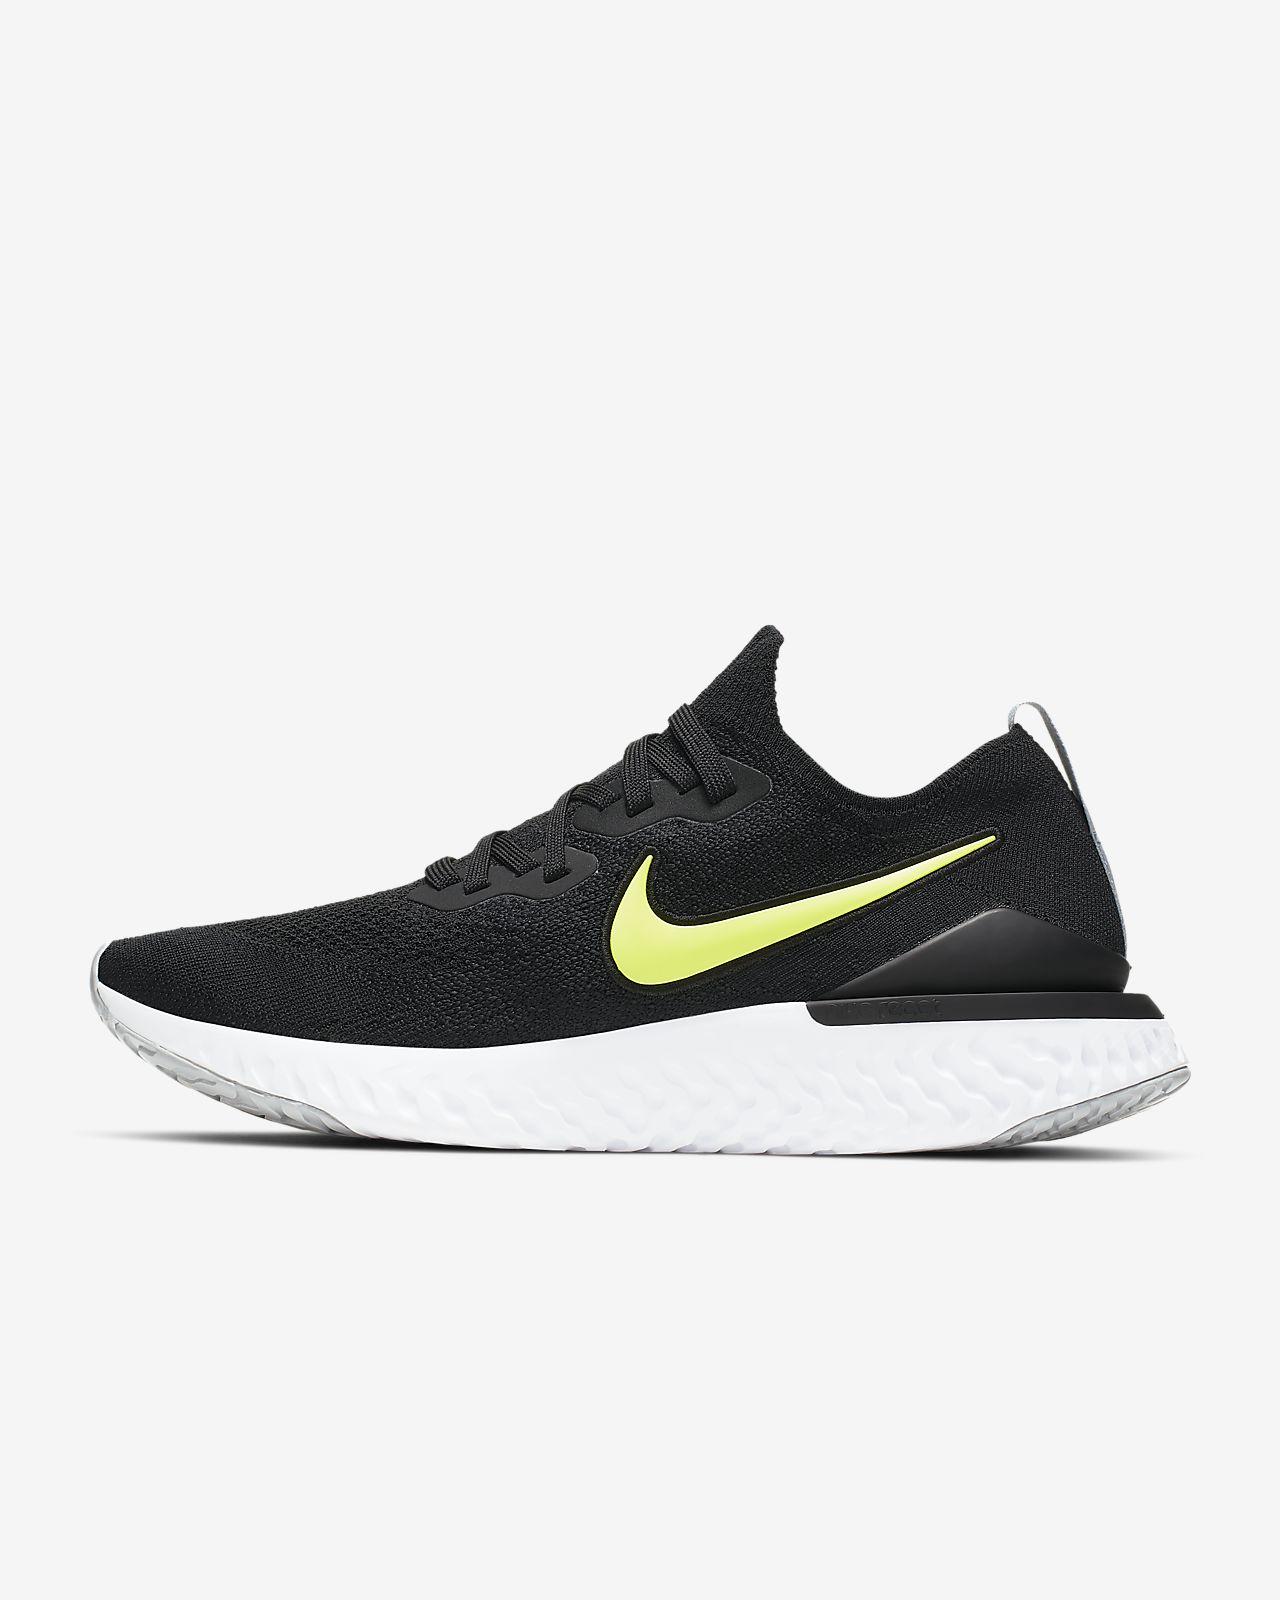 nike zapatillas futbol, Nike Performance FREE RUN FLYKNIT 2